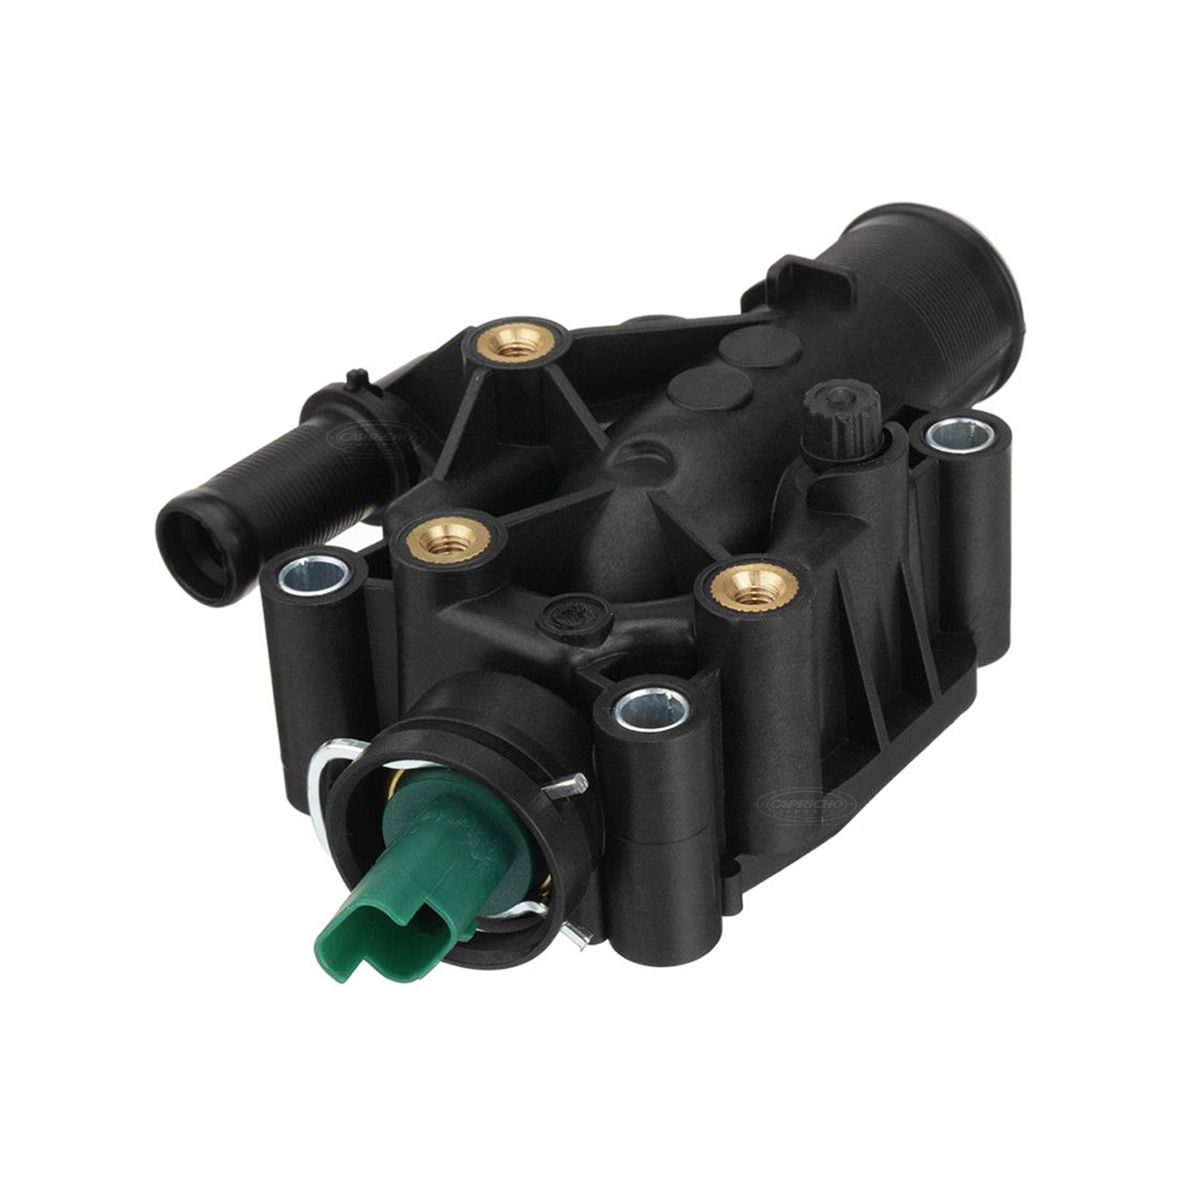 Carcaça Válvula Termostática Citroen Aircross C3 C4 1.6 16v